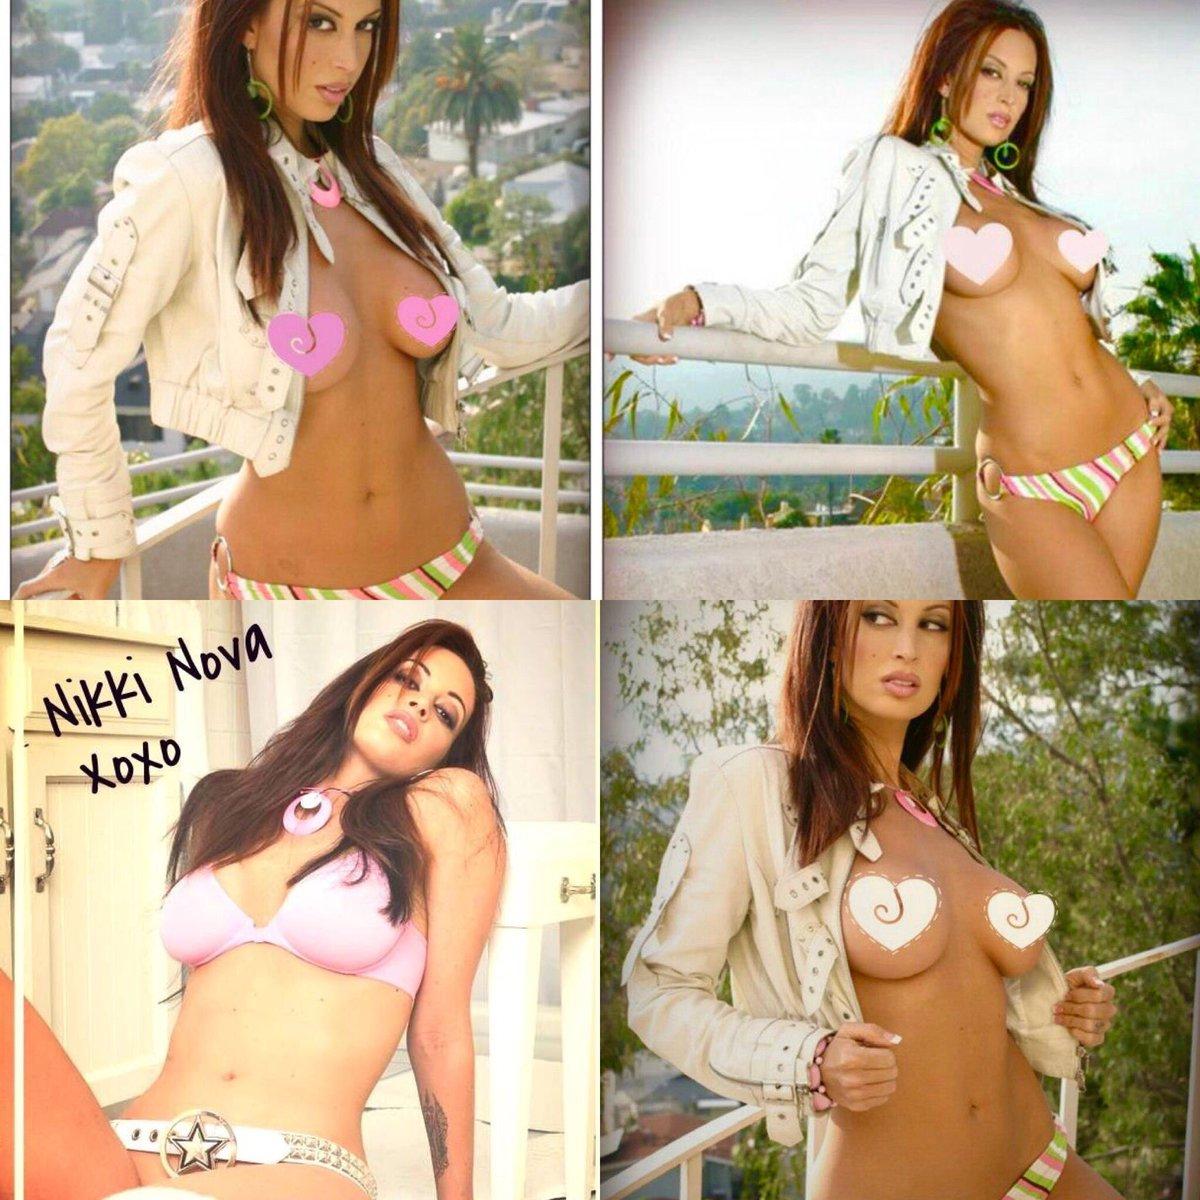 #FlashbackFriday #NikkiNova #model #LosAngeles #California u1LP7qgGgU